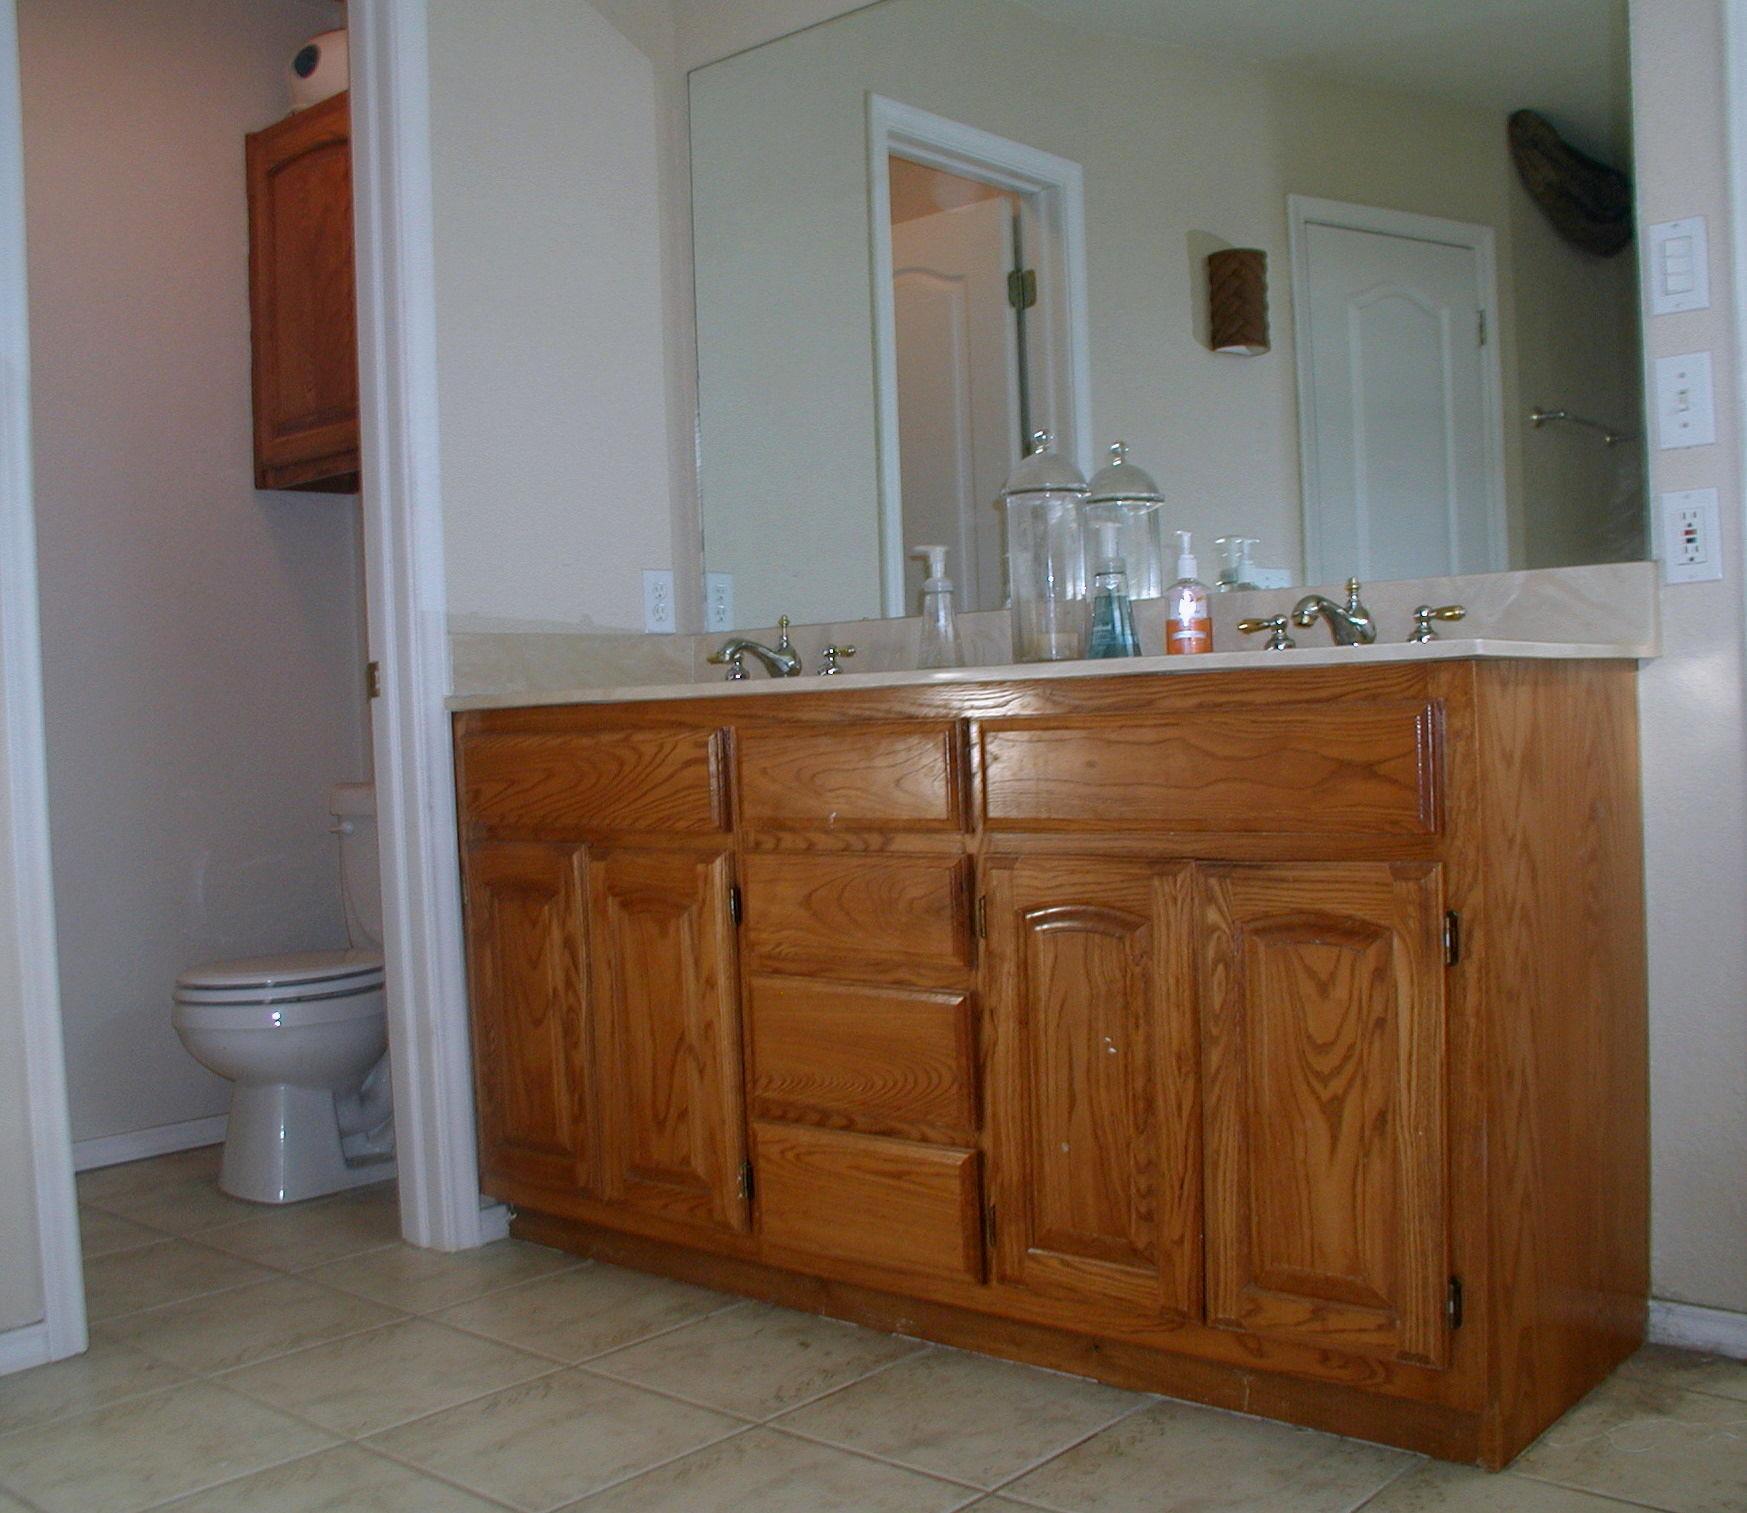 new bathroom storage cabinets construction-Fancy Bathroom Storage Cabinets Portrait